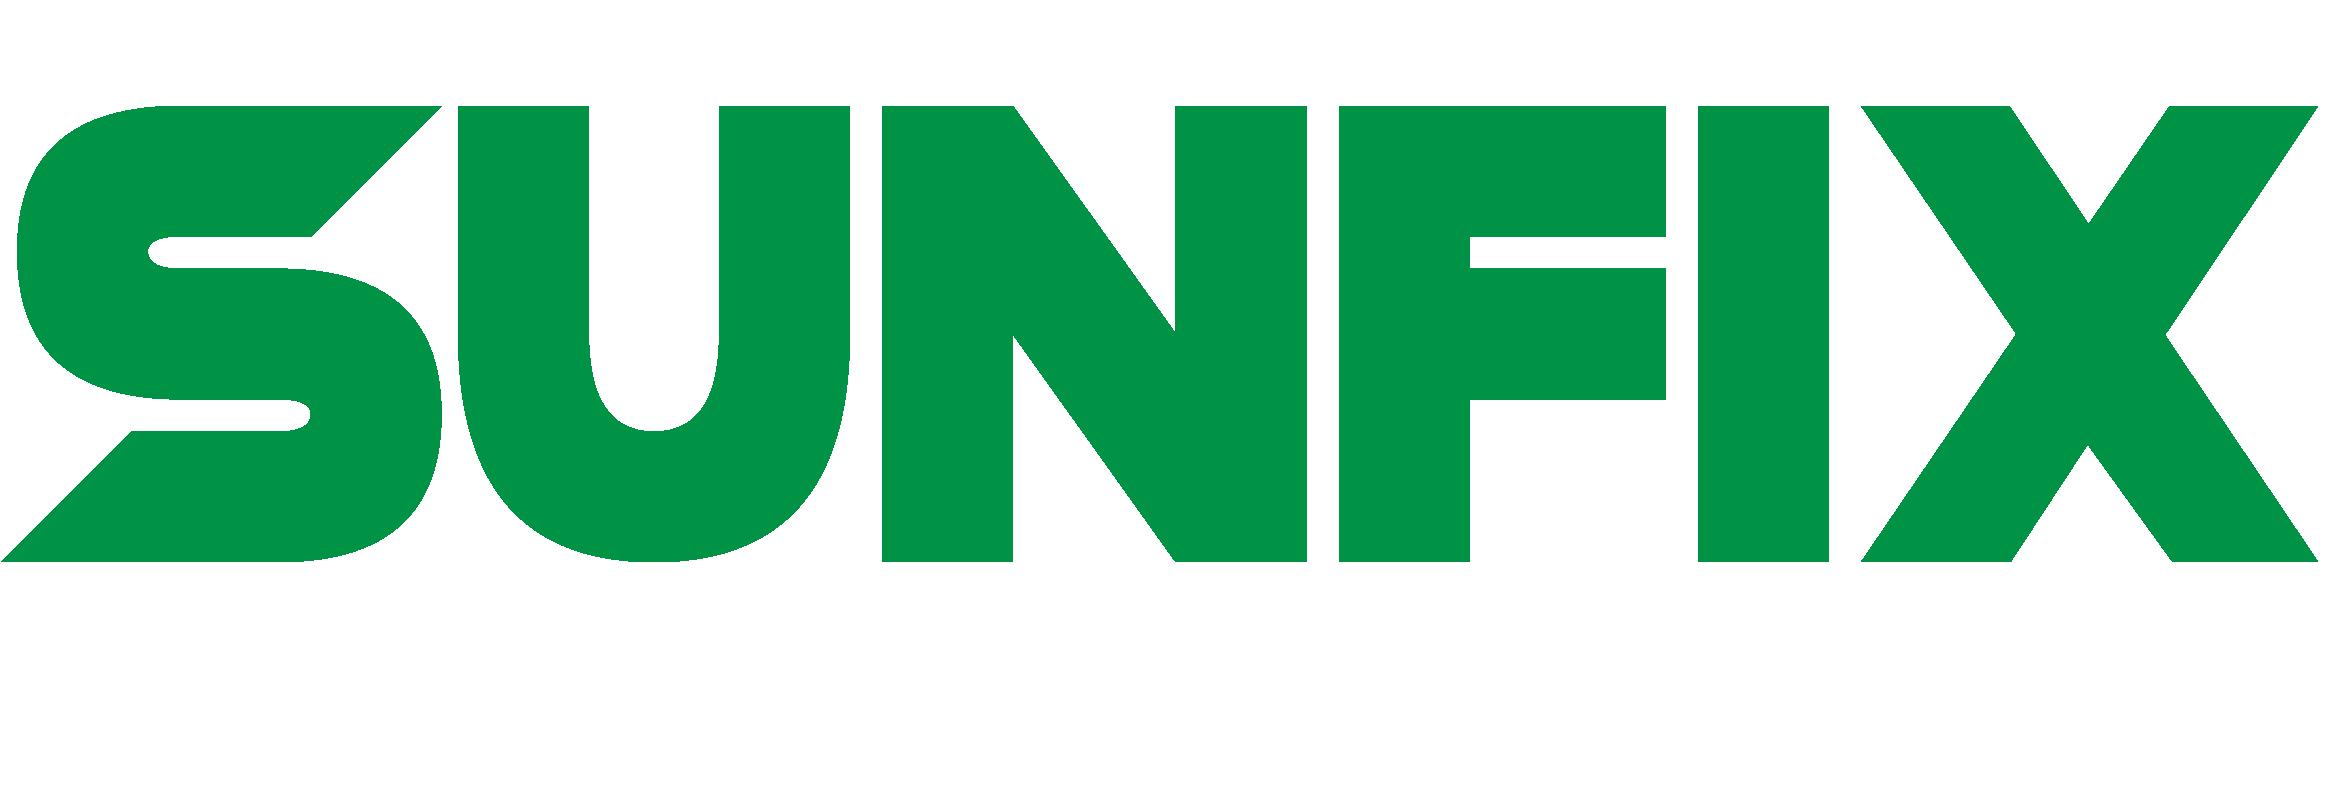 https://secureservercdn.net/198.71.233.185/sz0.269.myftpupload.com/wp-content/uploads/2020/10/SUNFIX-Consulting-W.png?time=1635381168